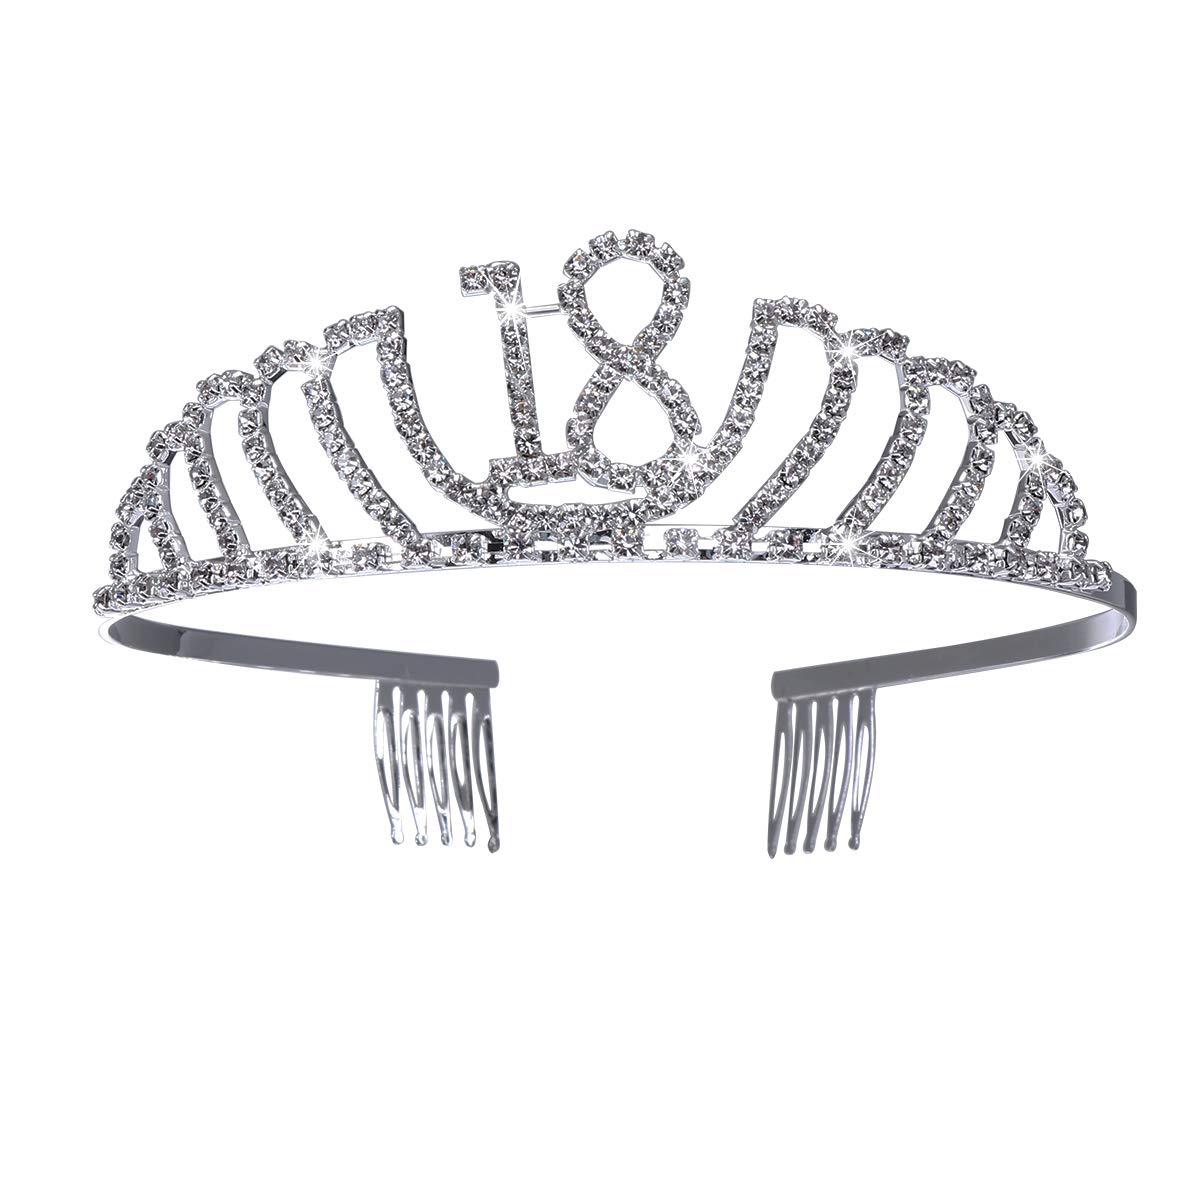 Frcolor 80th Birthday Tiara Crystal Rhinestone Birthday Tiara Queen Crowns Headband With Hair Combs Clip